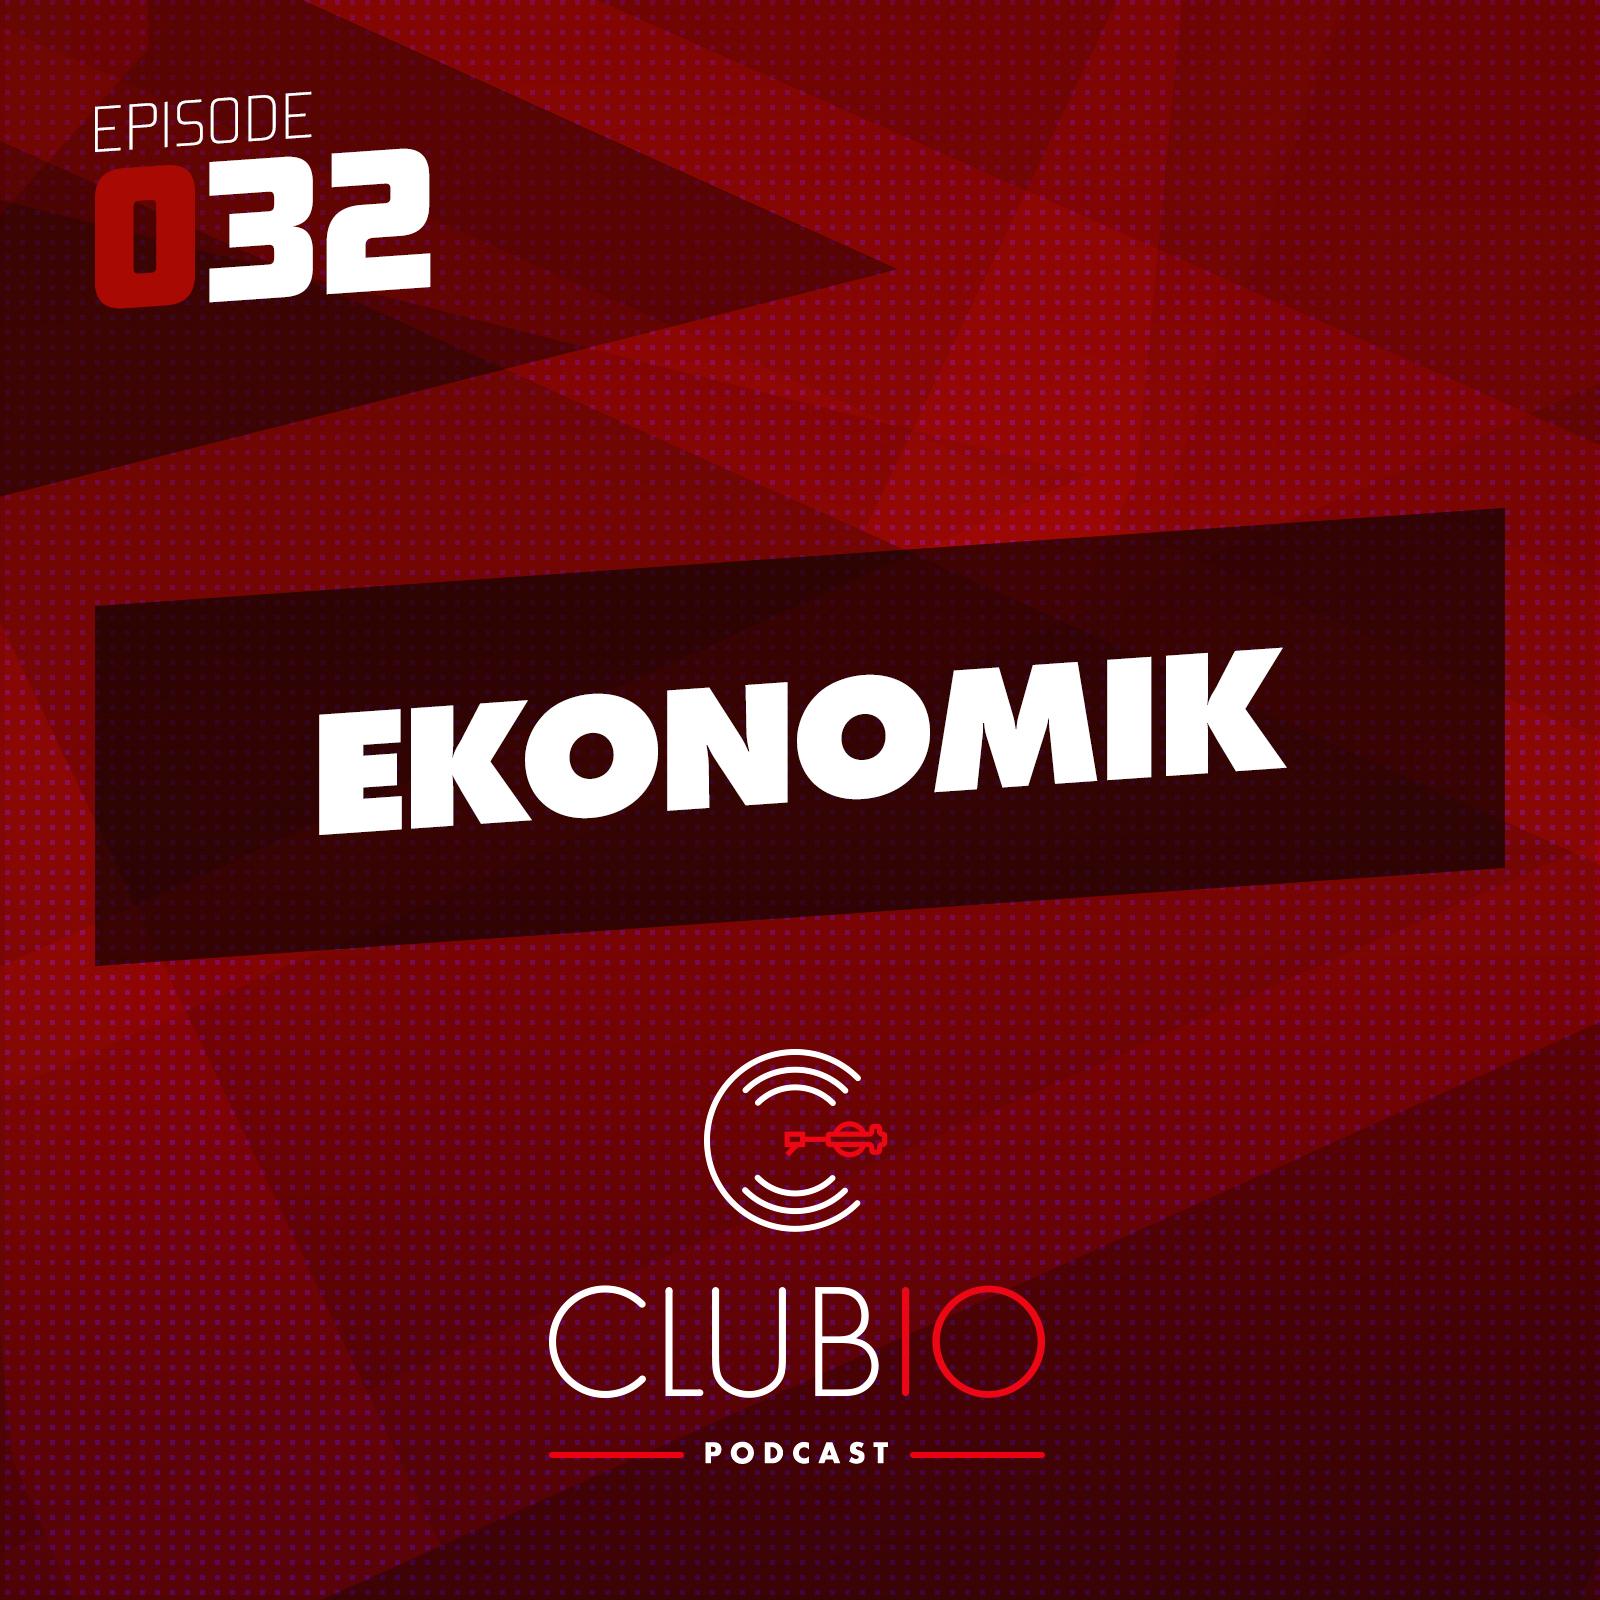 Clubio Podcast 032 - Ekonomik